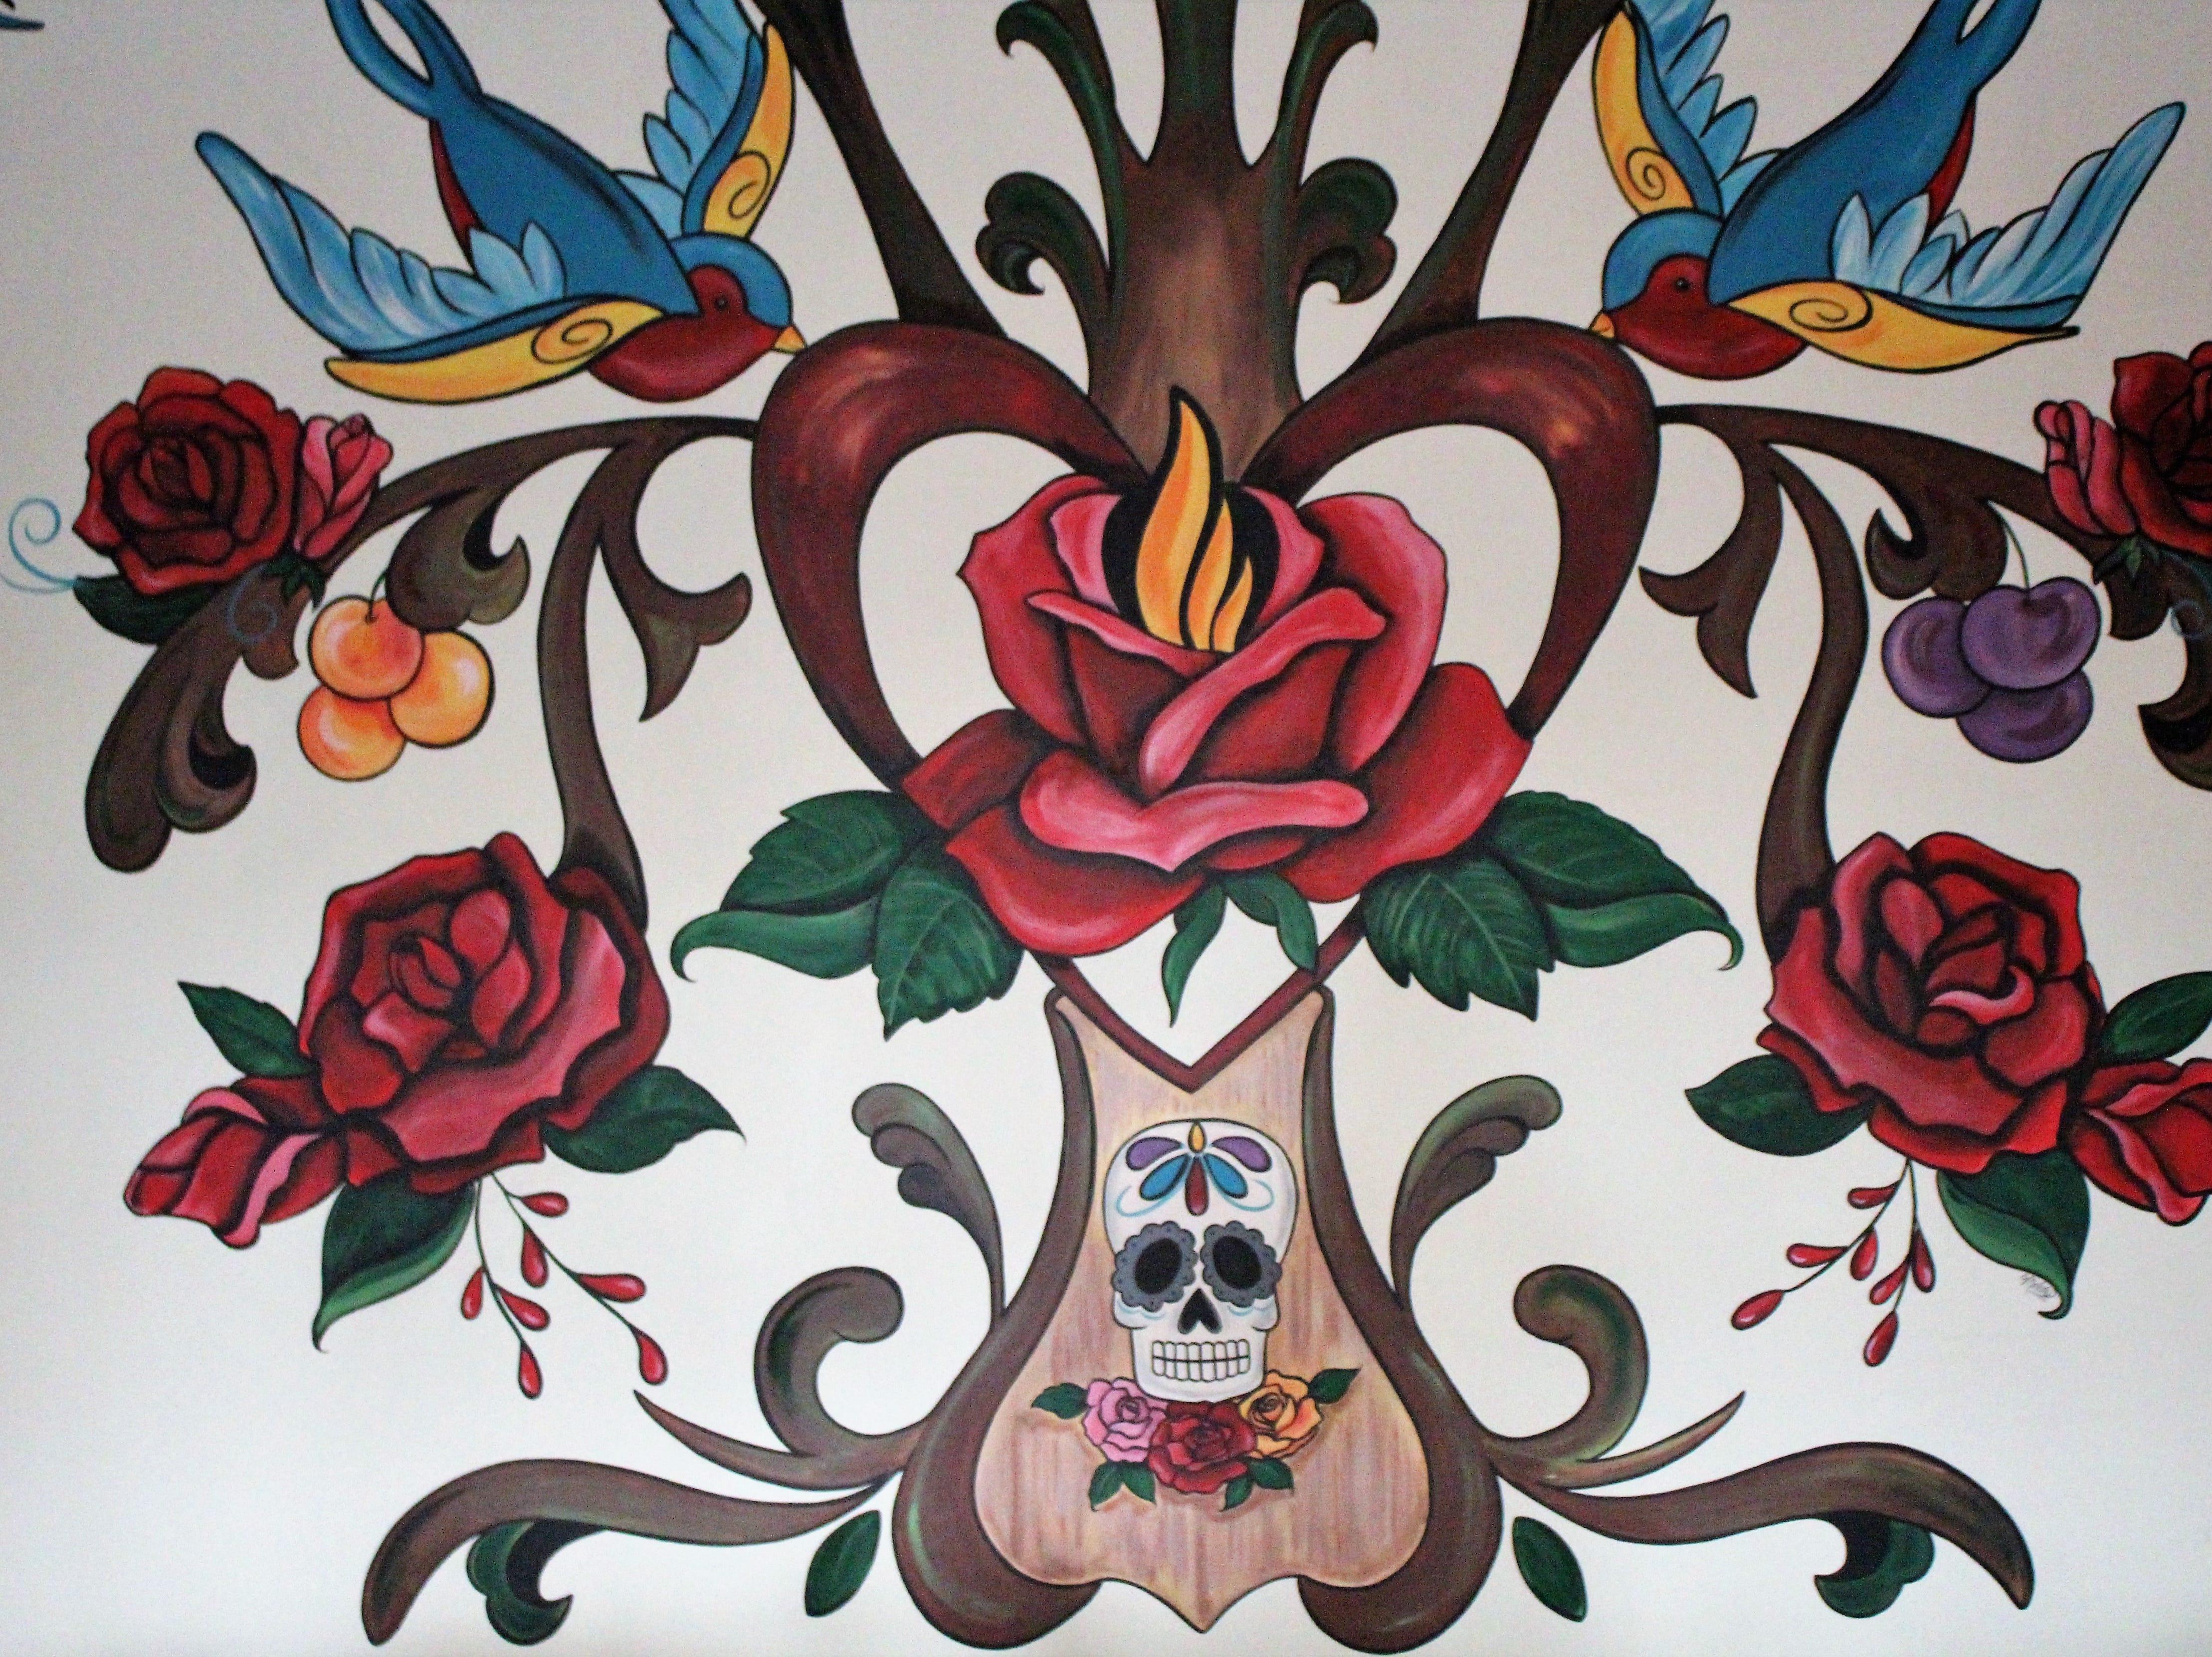 A mural inside the dining room Casa Terra, a vegan fine dining restaurant in Glendale, features the restaurant's logo.